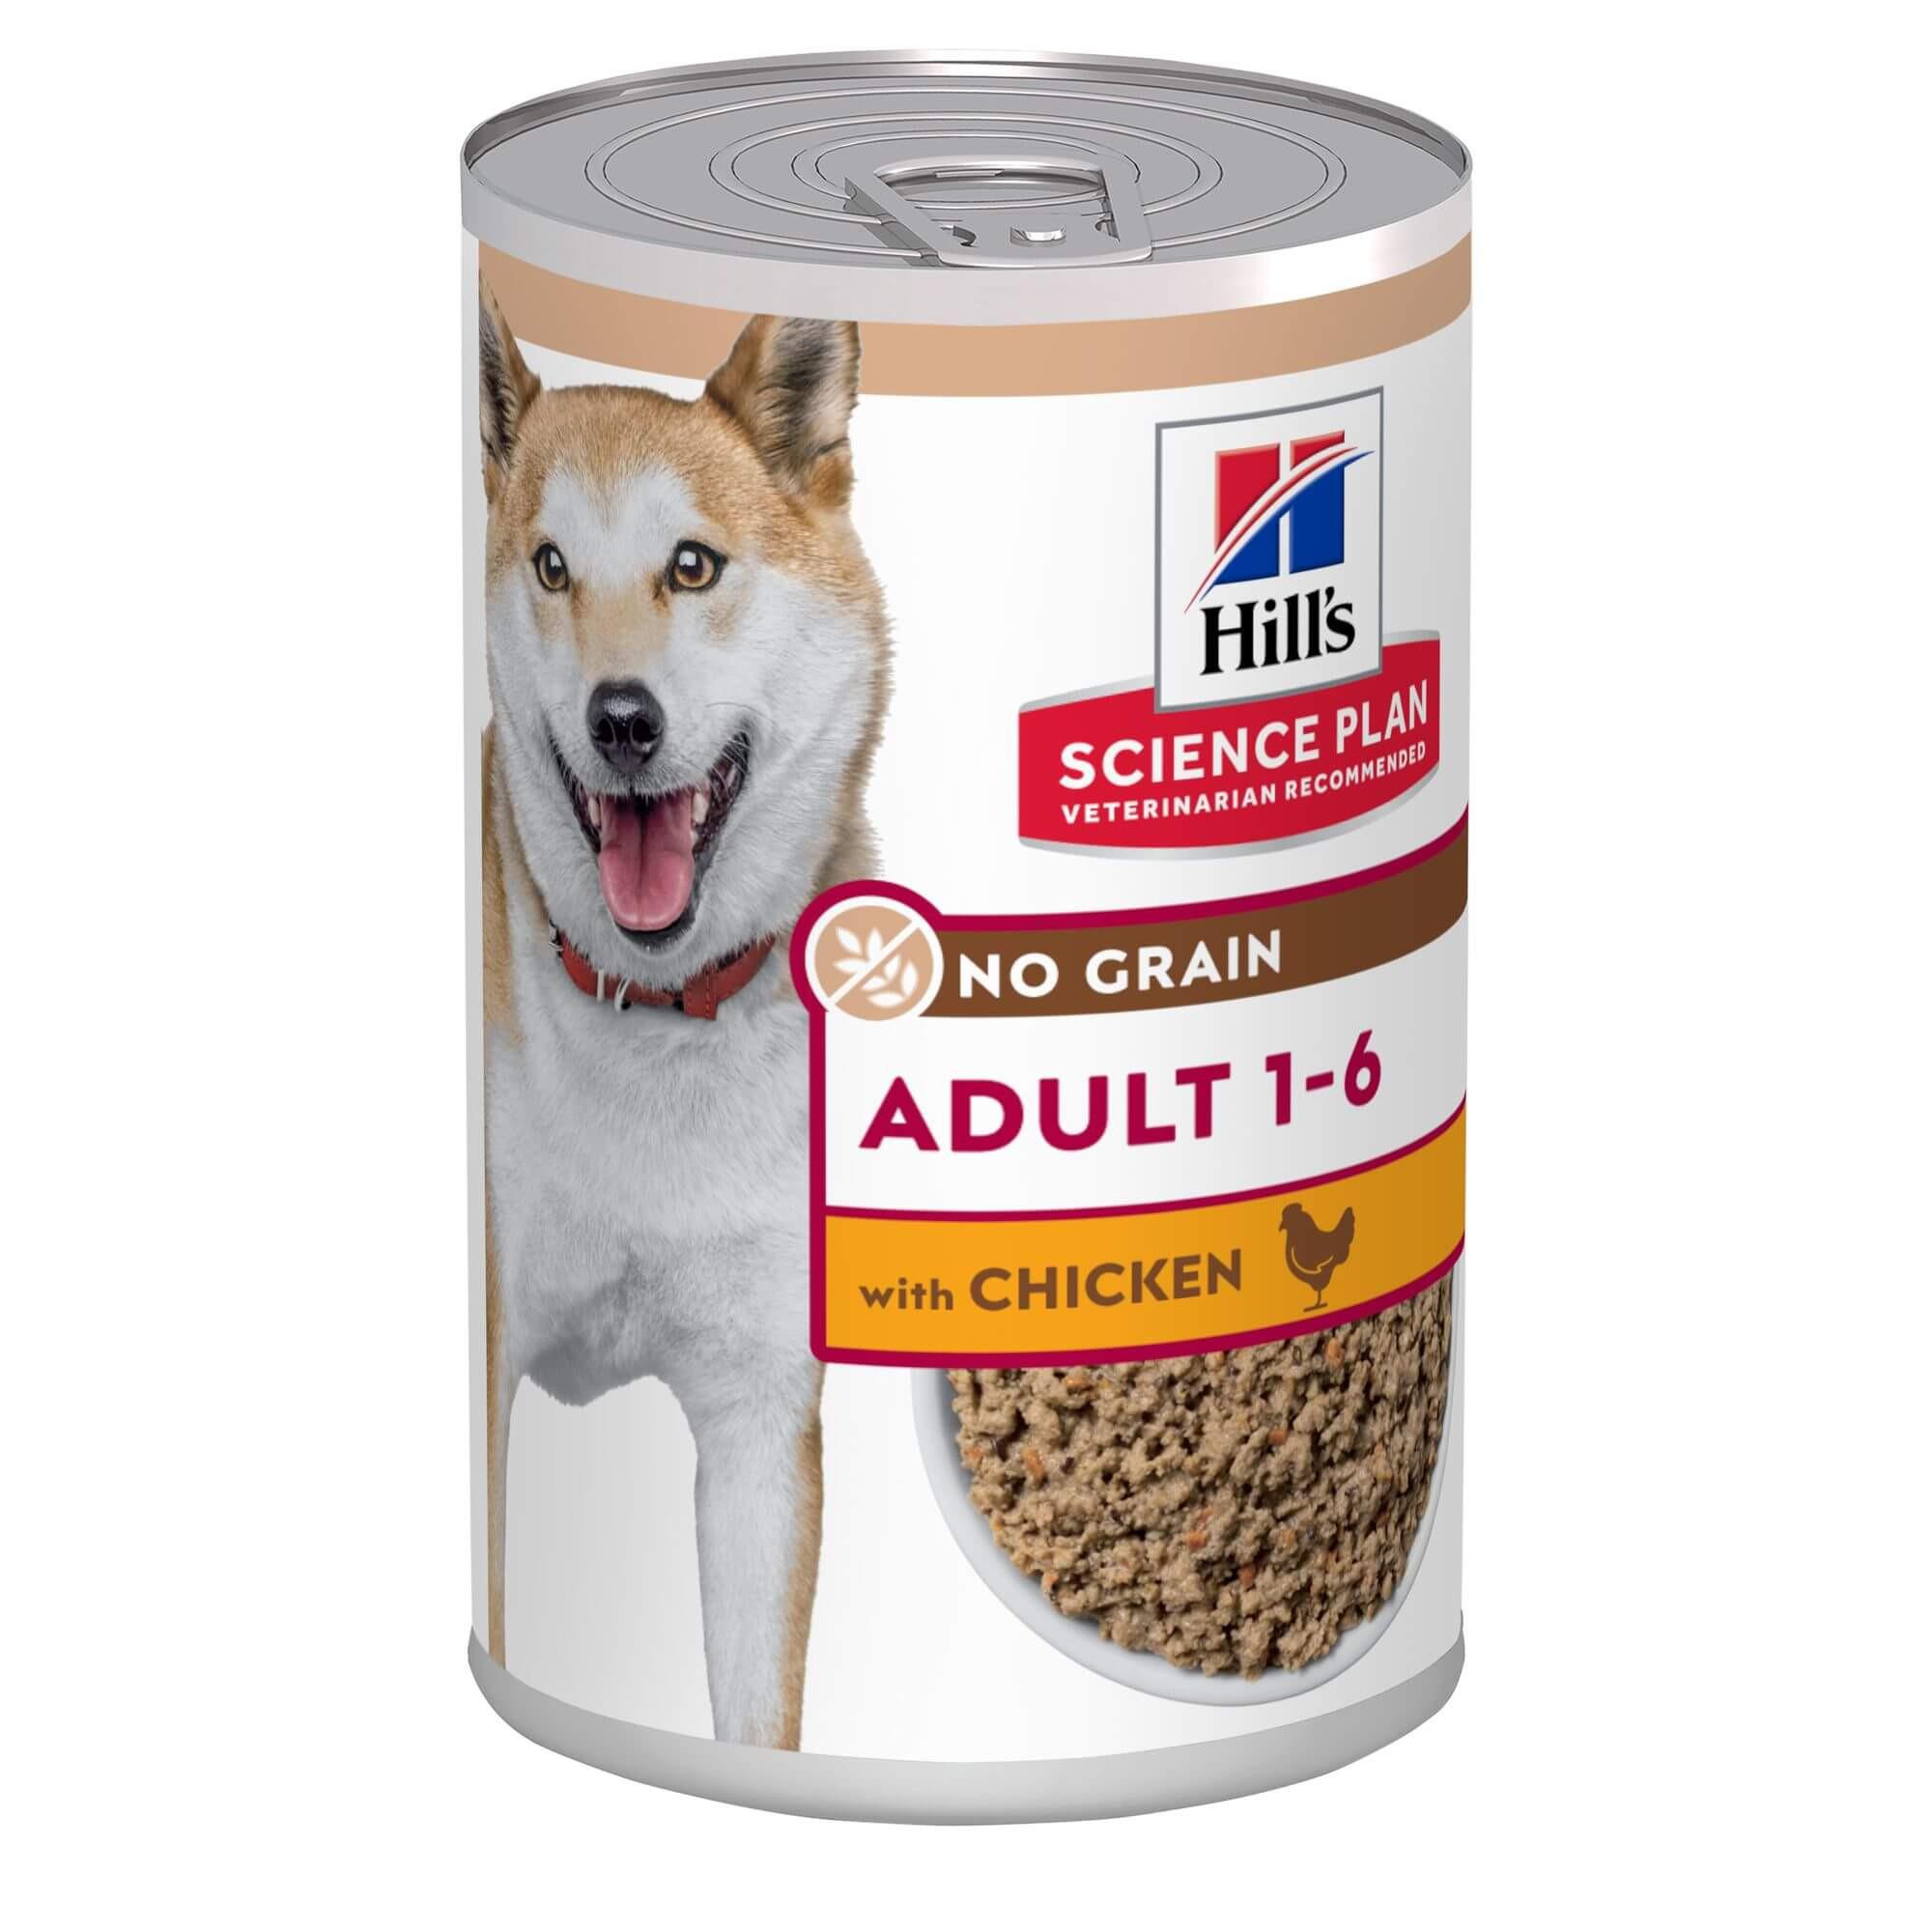 Hill's Adult No Grain met kip nat hondenvoer 363g blik